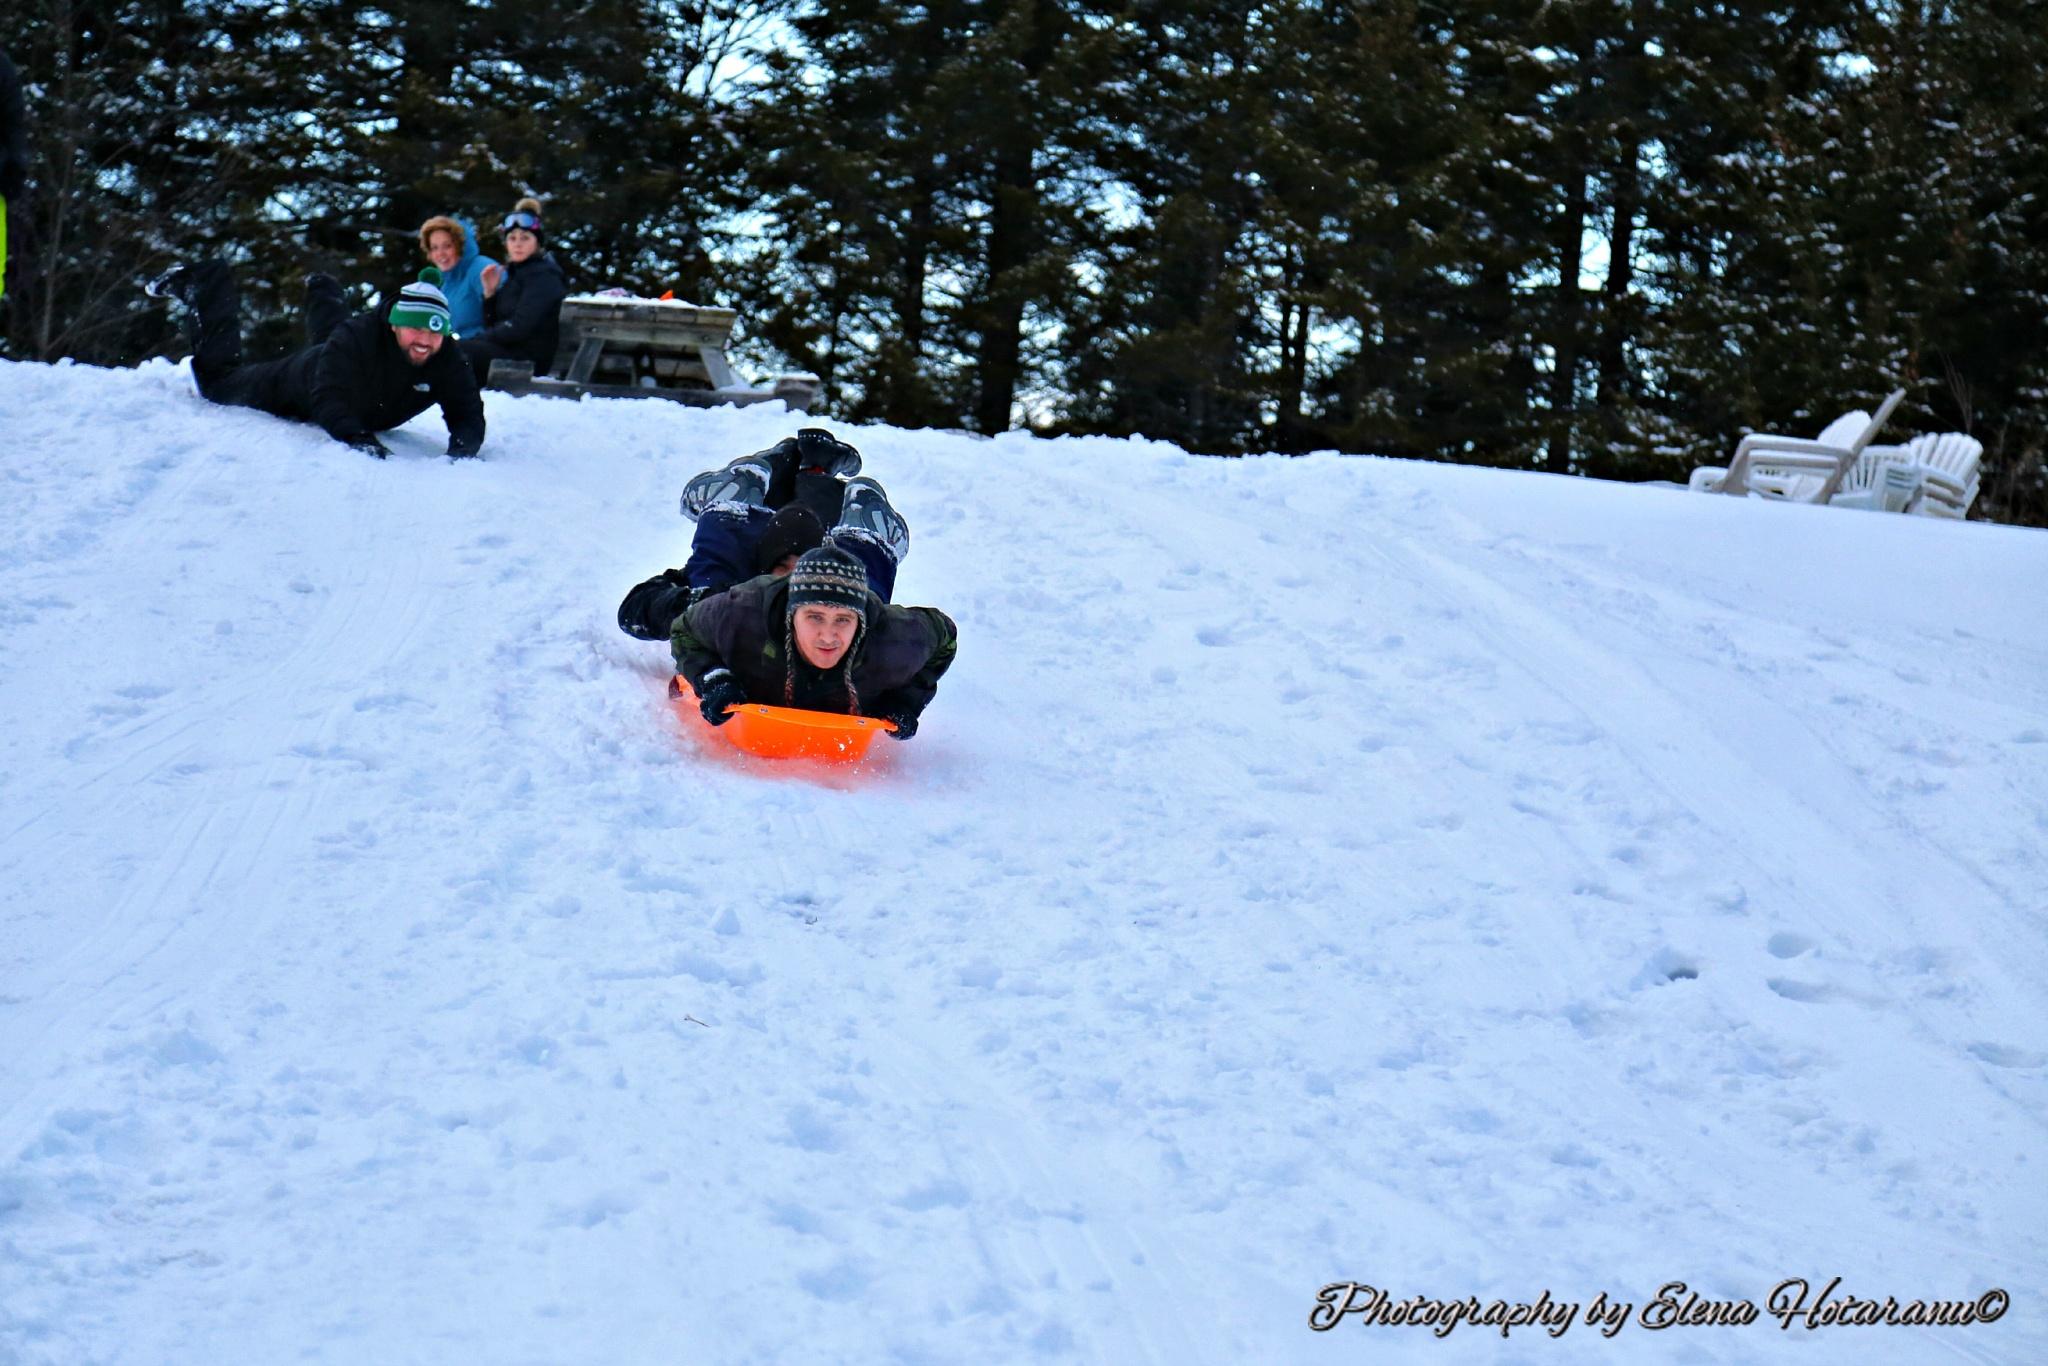 The Sledding Team goes down the hill by Elena Hotaranu